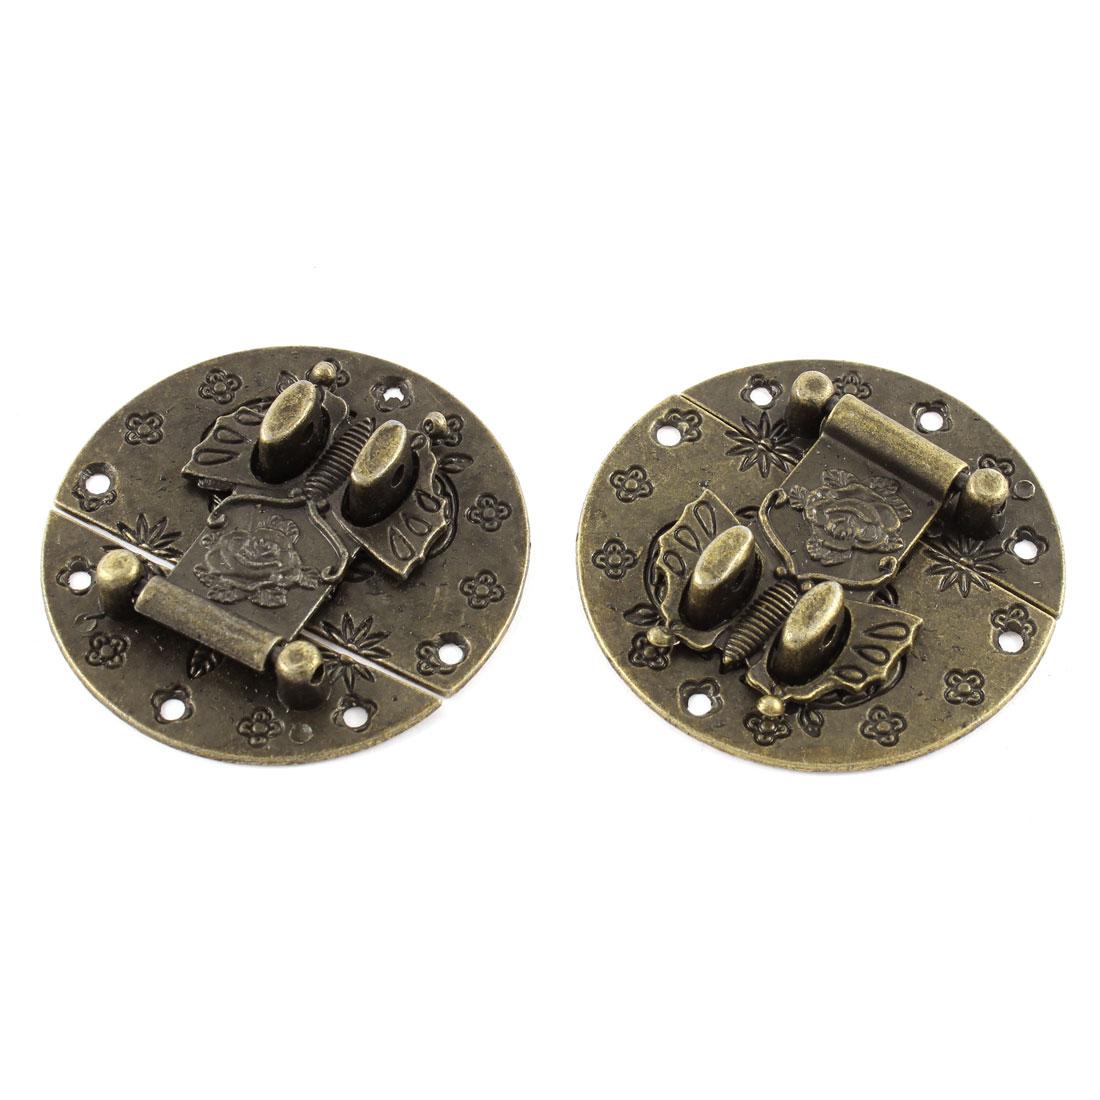 2pcs 58mmx58mm Bronze Tone Box Suitcase Decorative Hasp Latch Lock